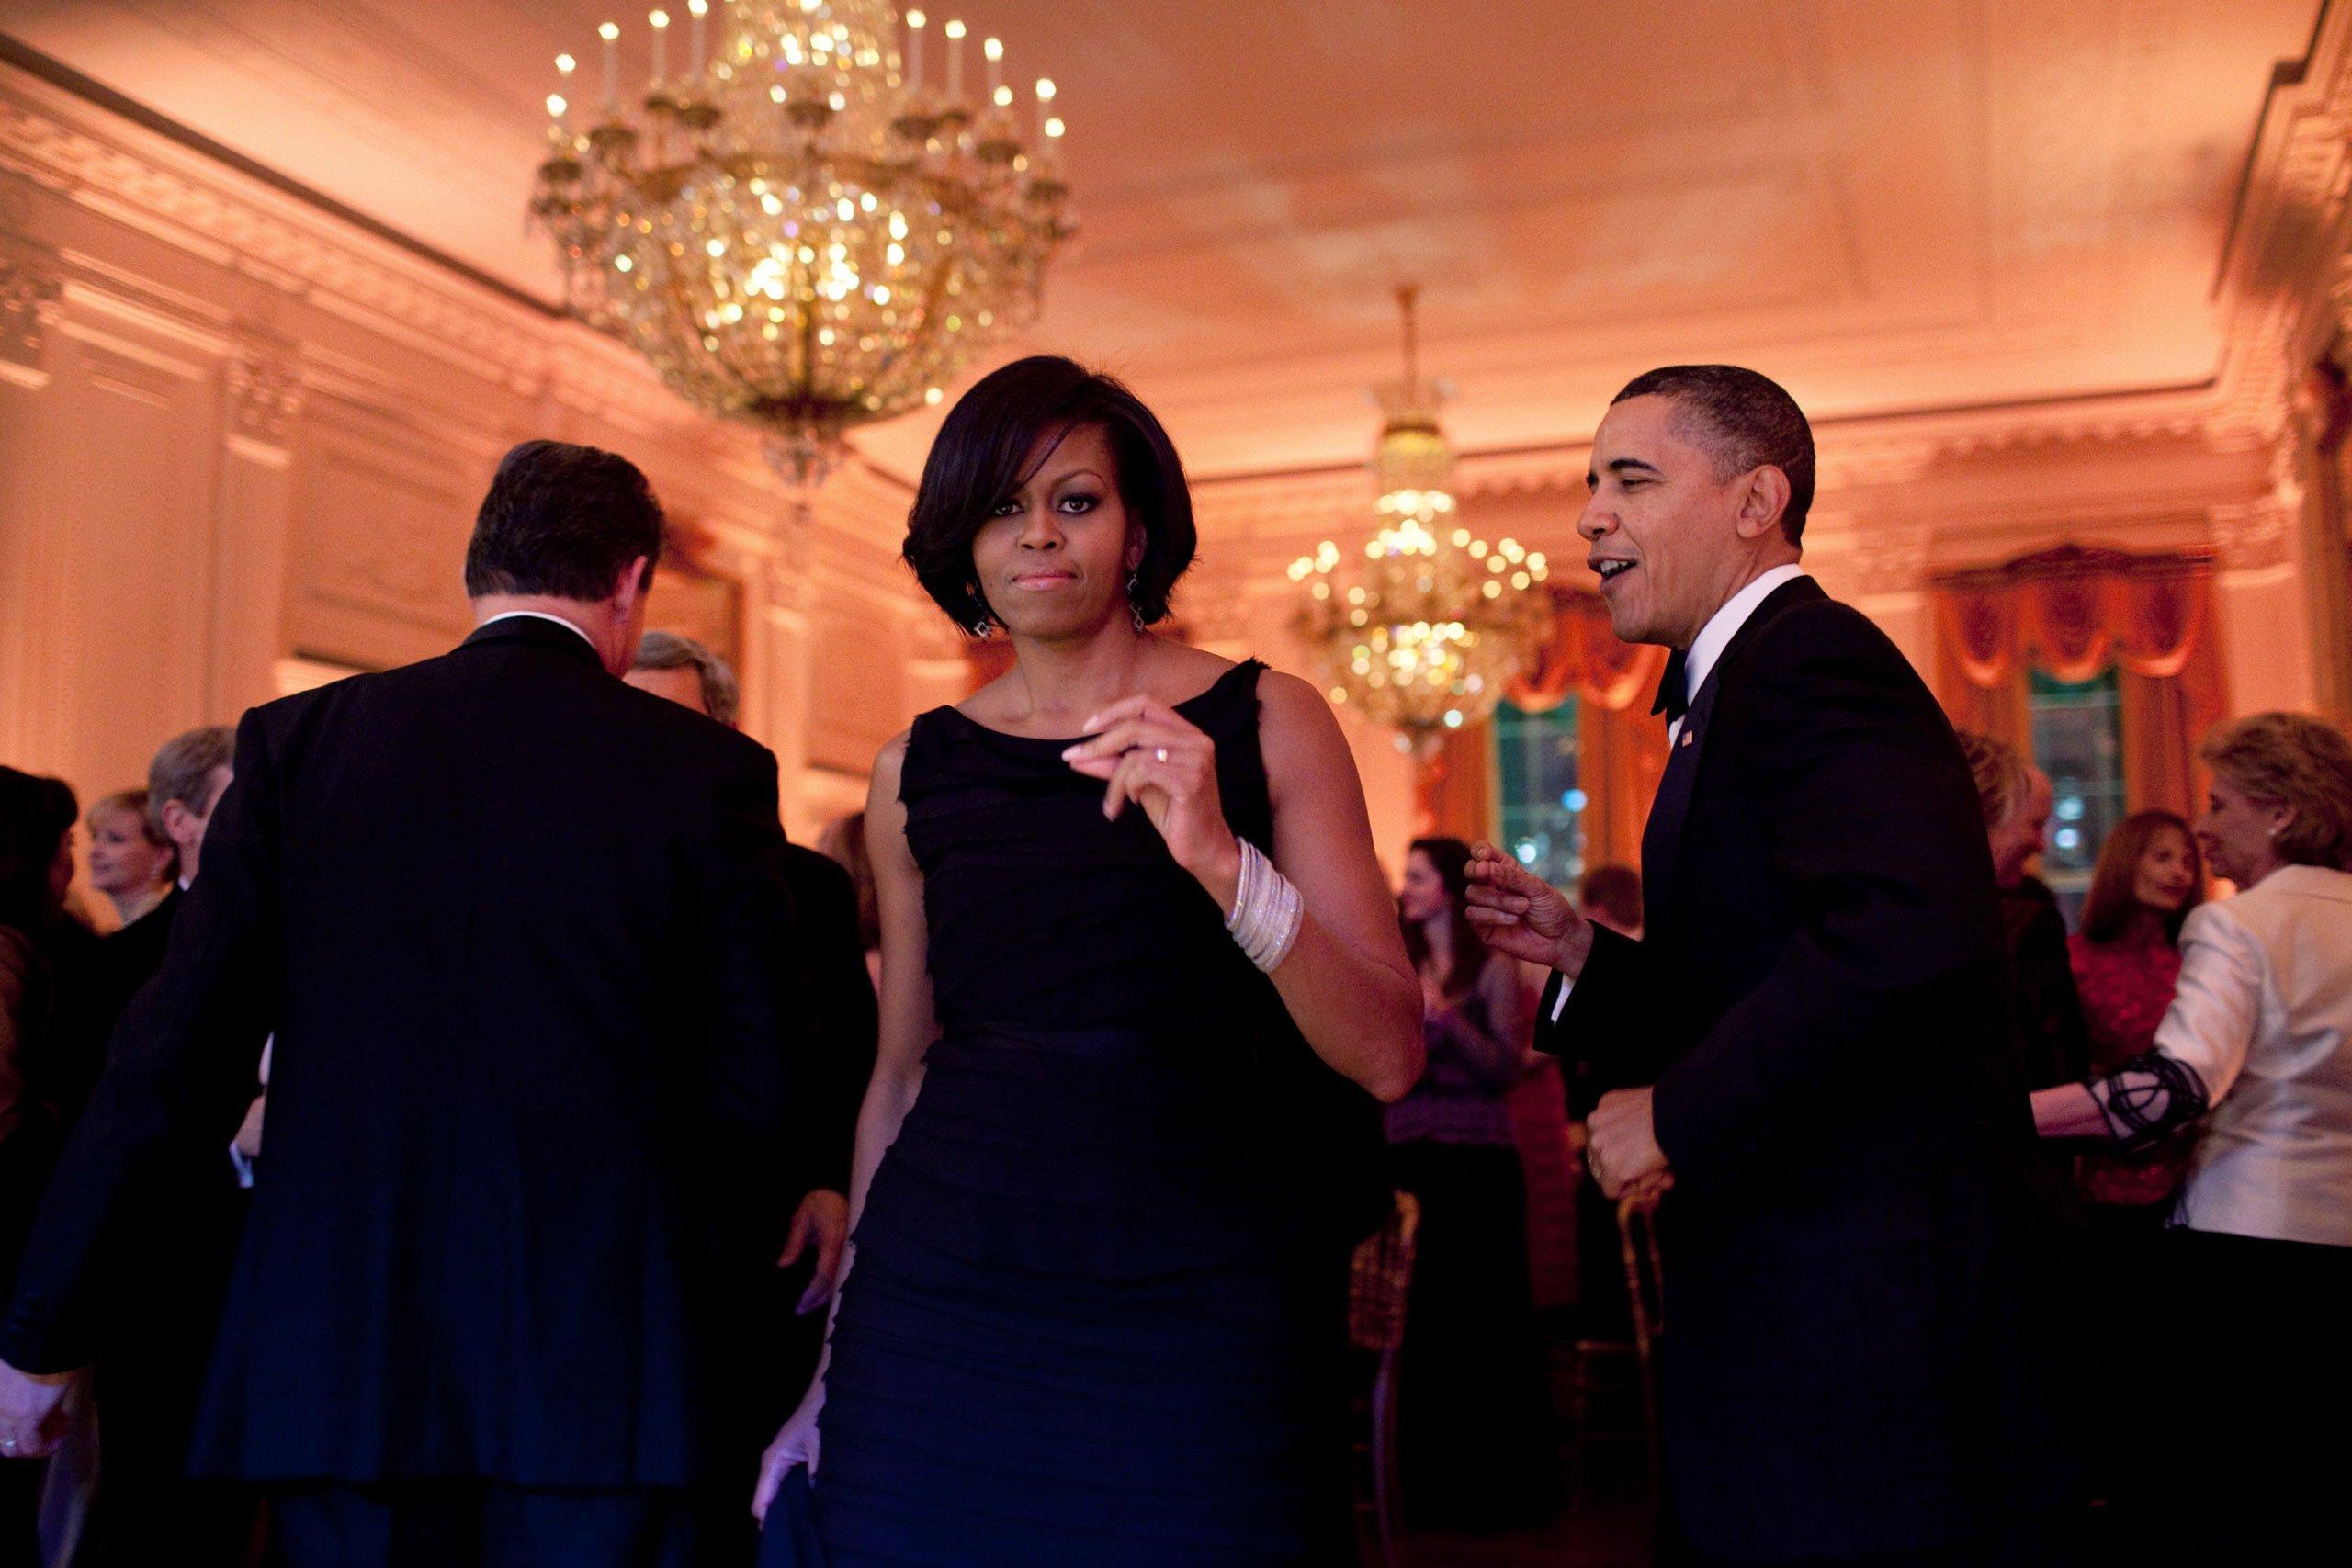 Michelle Obama dancing with Barack Obama